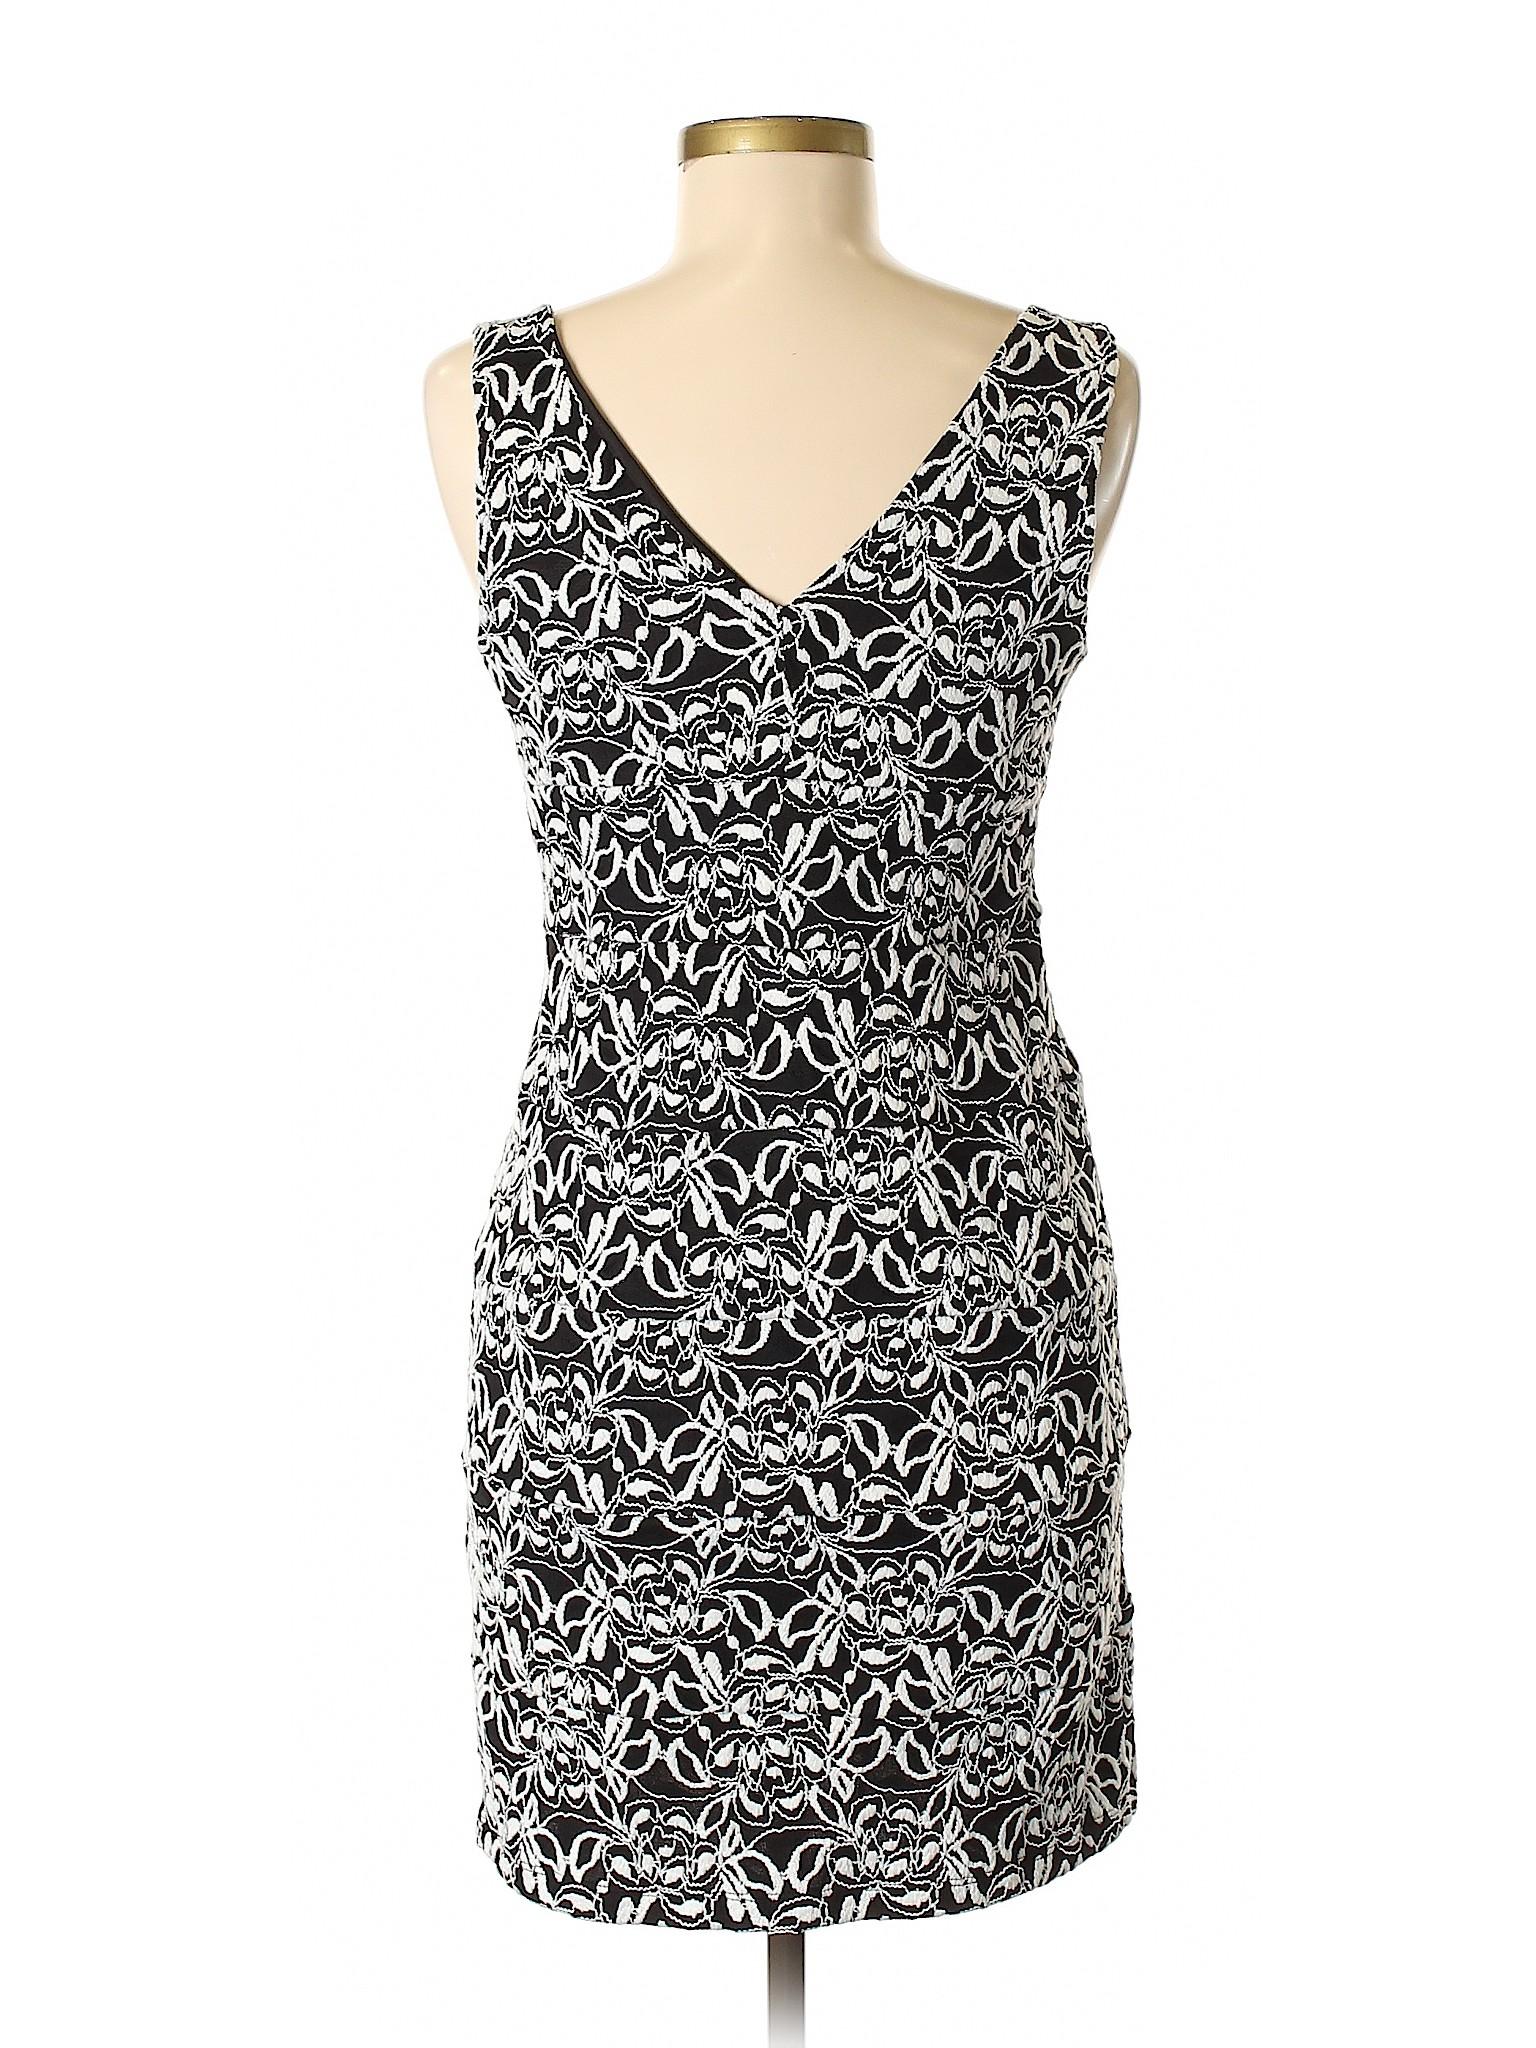 Bertinelli Bertinelli Valerie Selling Casual Dress Selling Valerie 6Uzqw0w